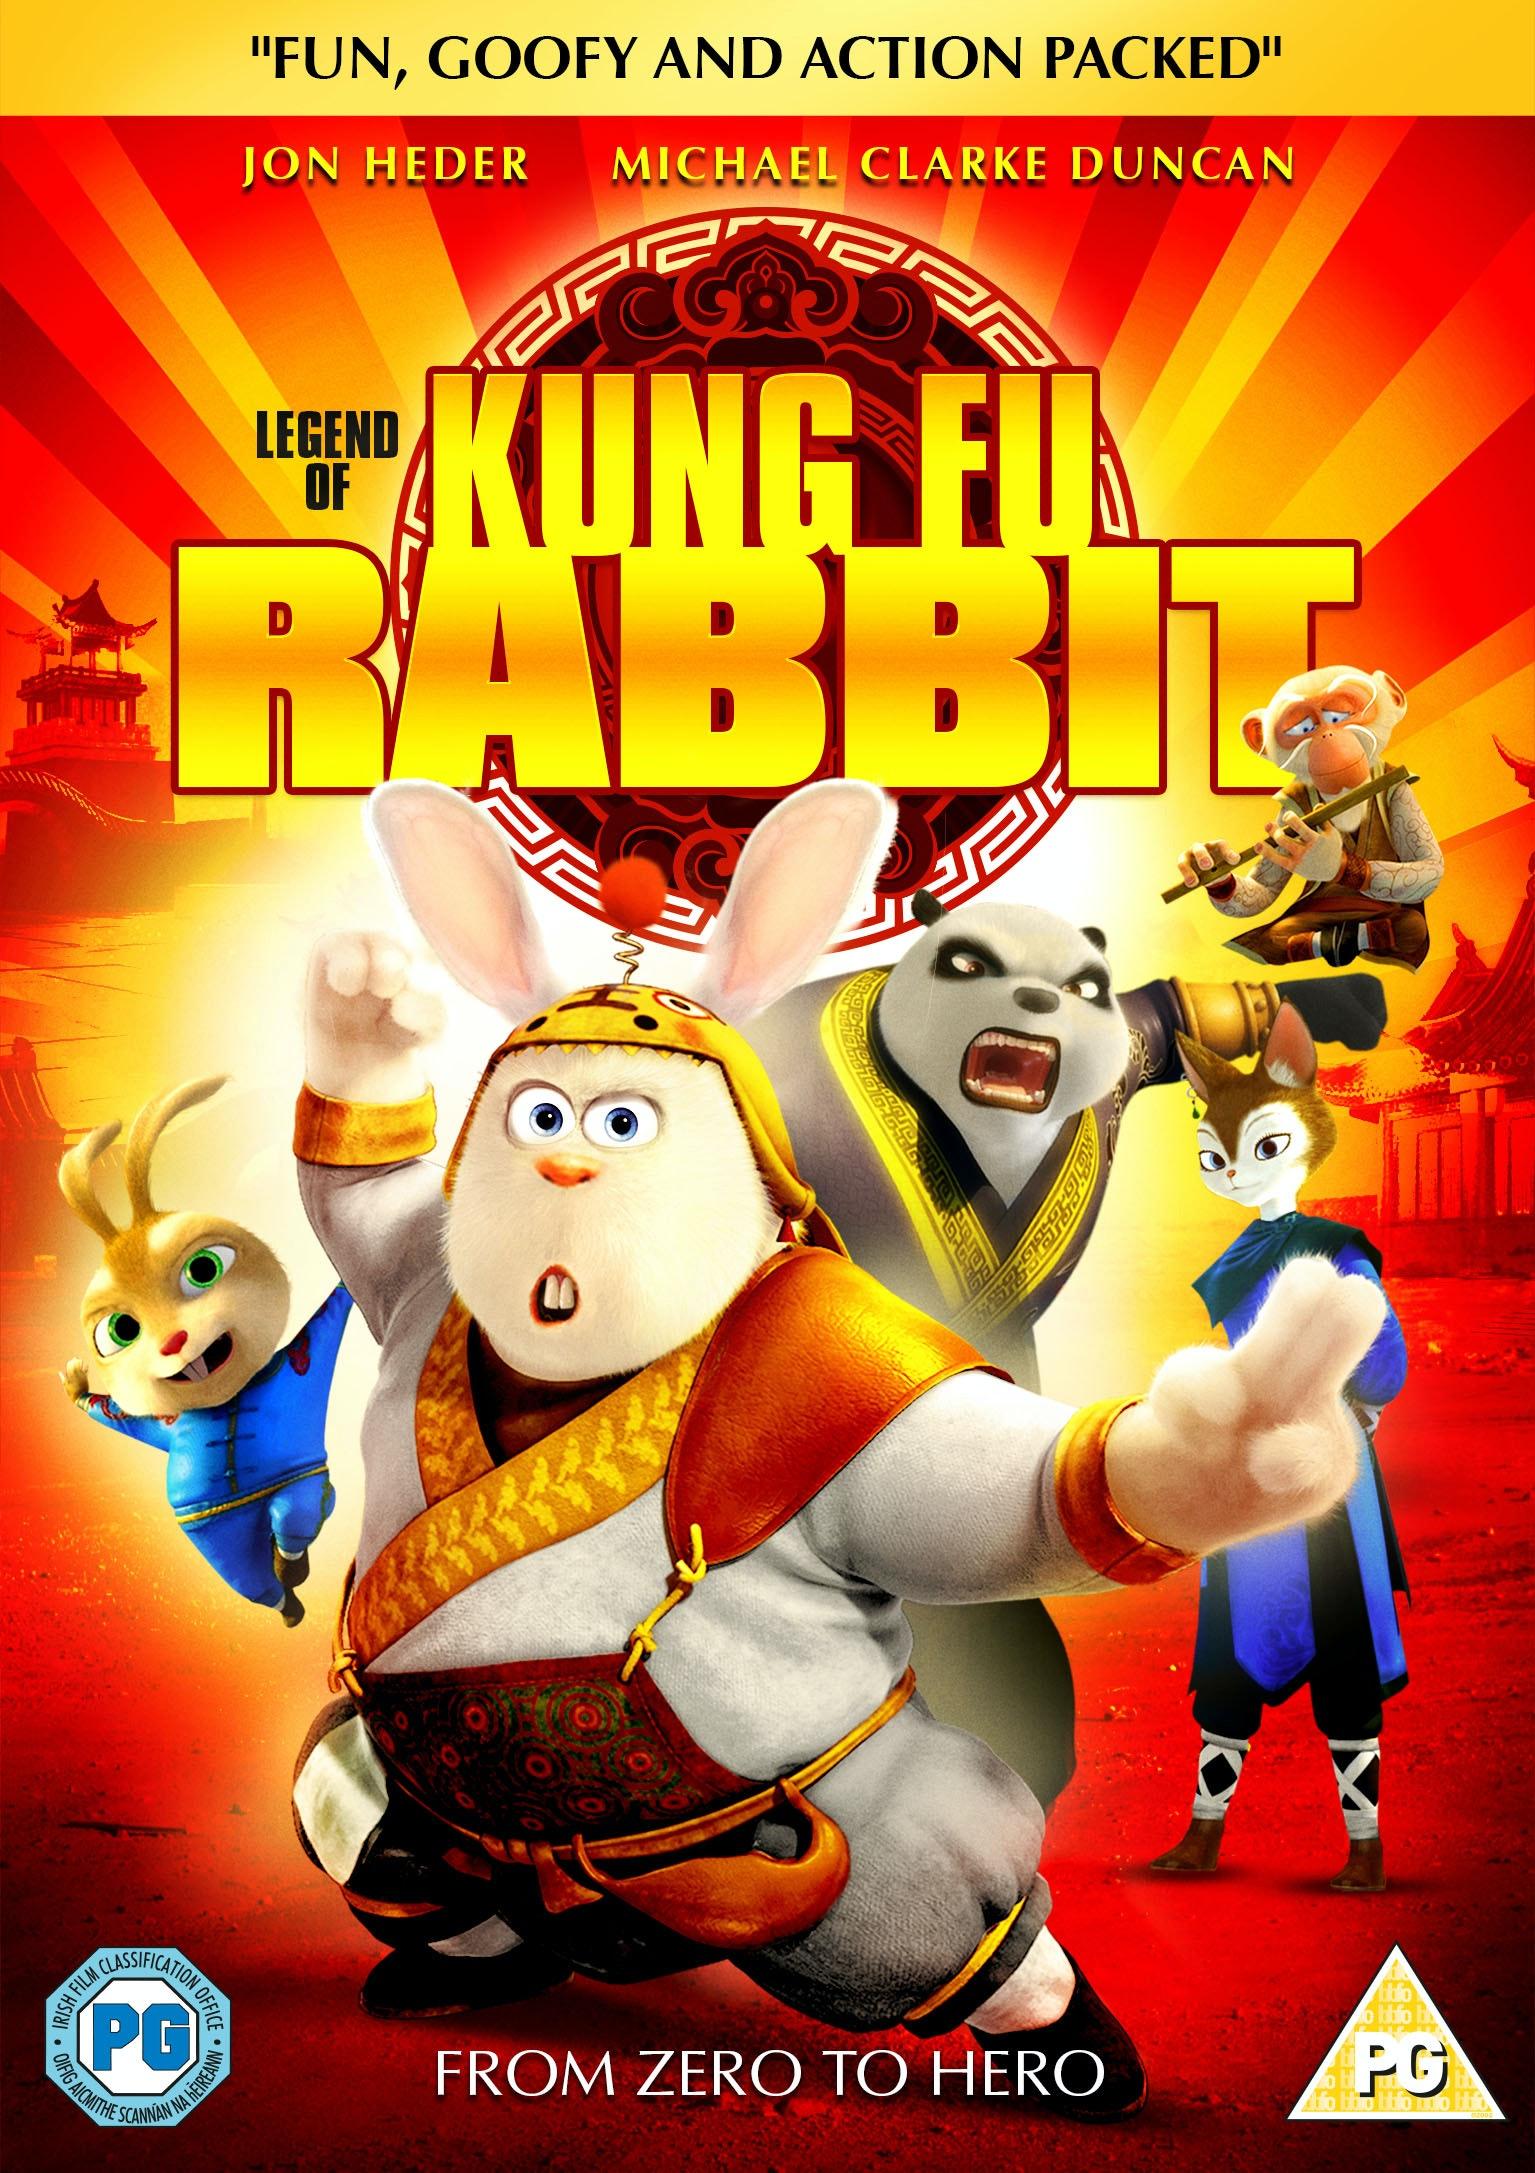 Kung fu rabbit dvd 2d jpg